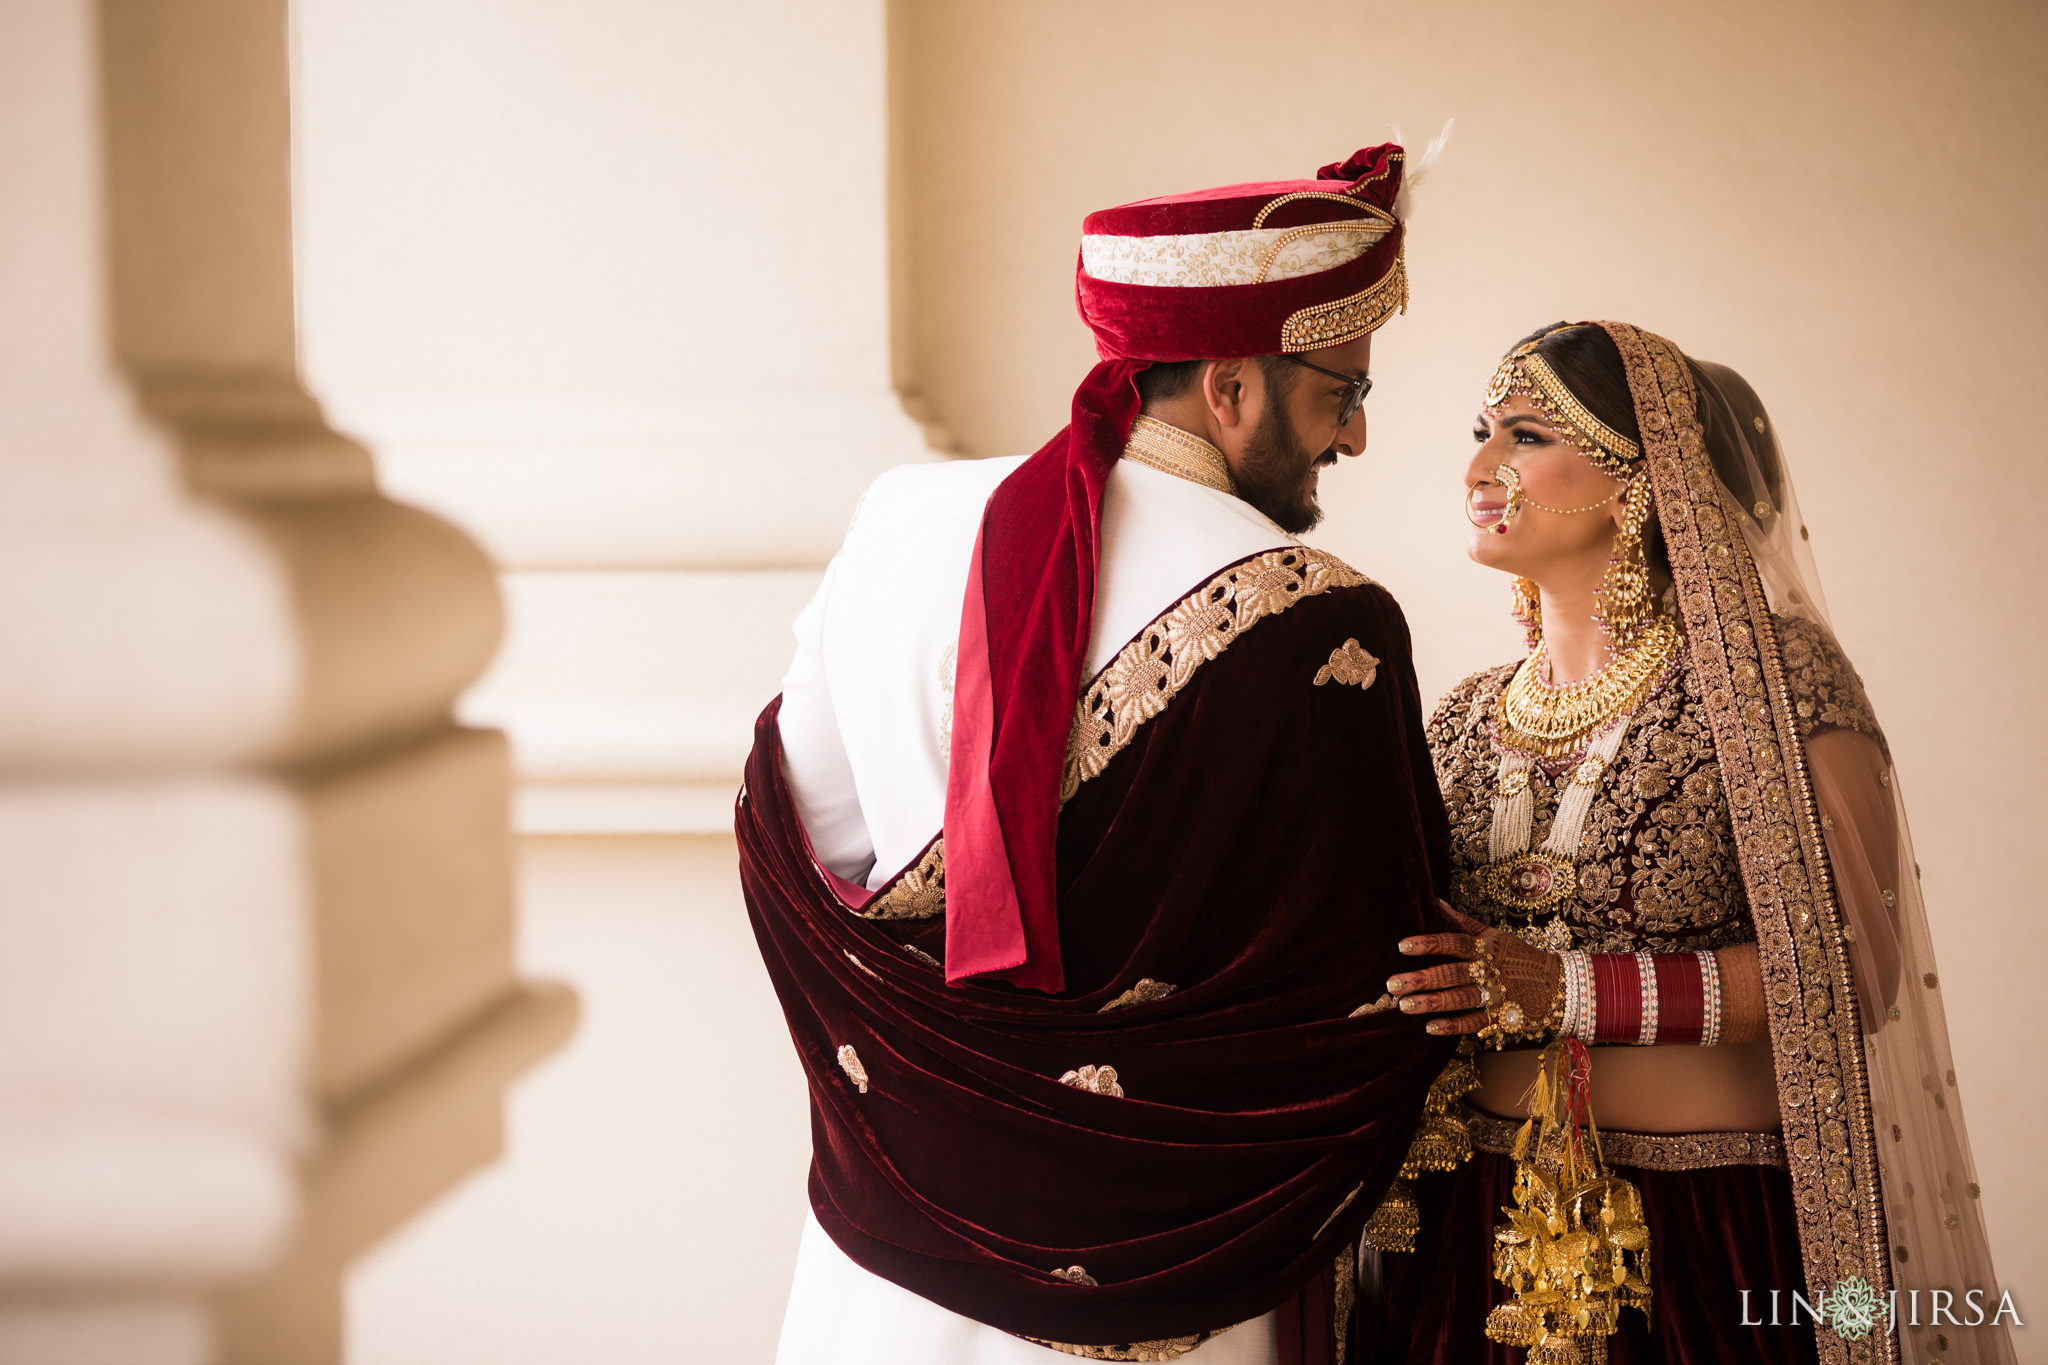 011 monarch beach resort dana point indian bride groom wedding photography